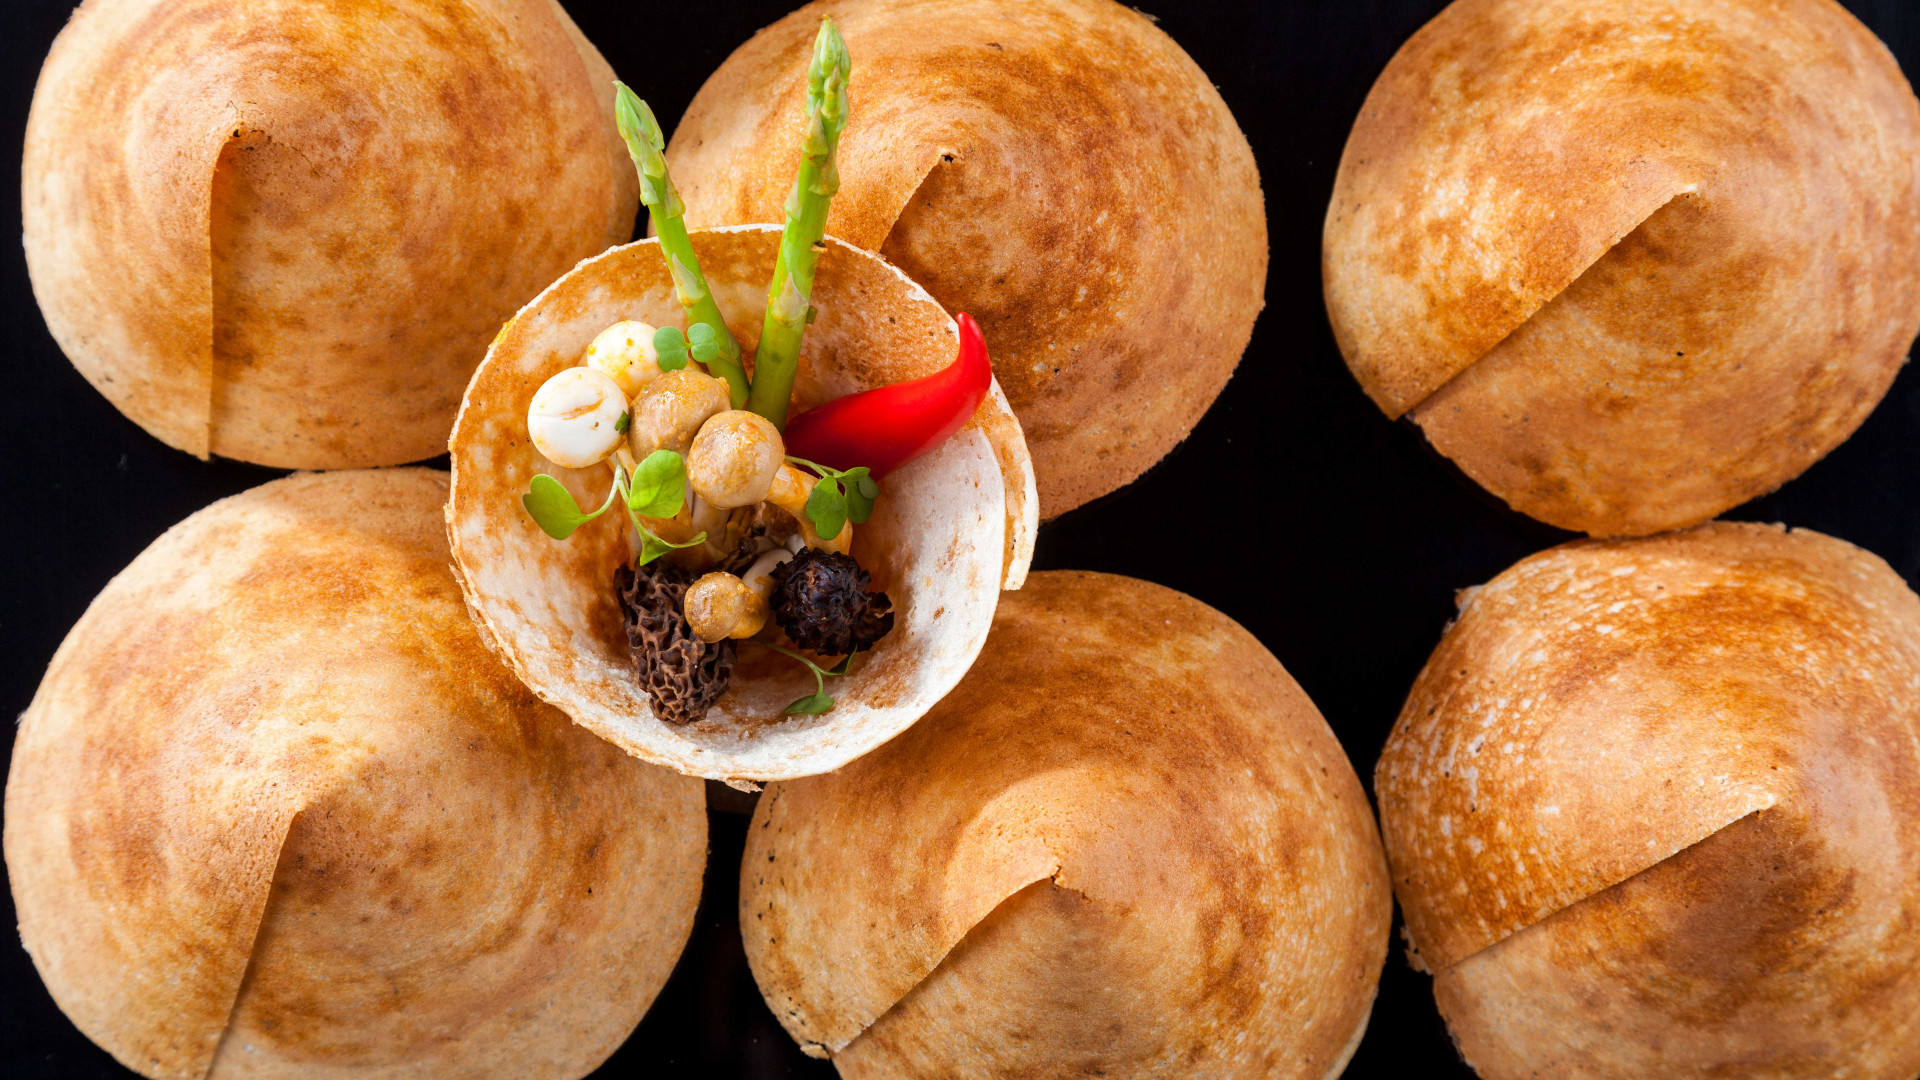 Masala wild mushroom, water chestnut, paper roast dosai